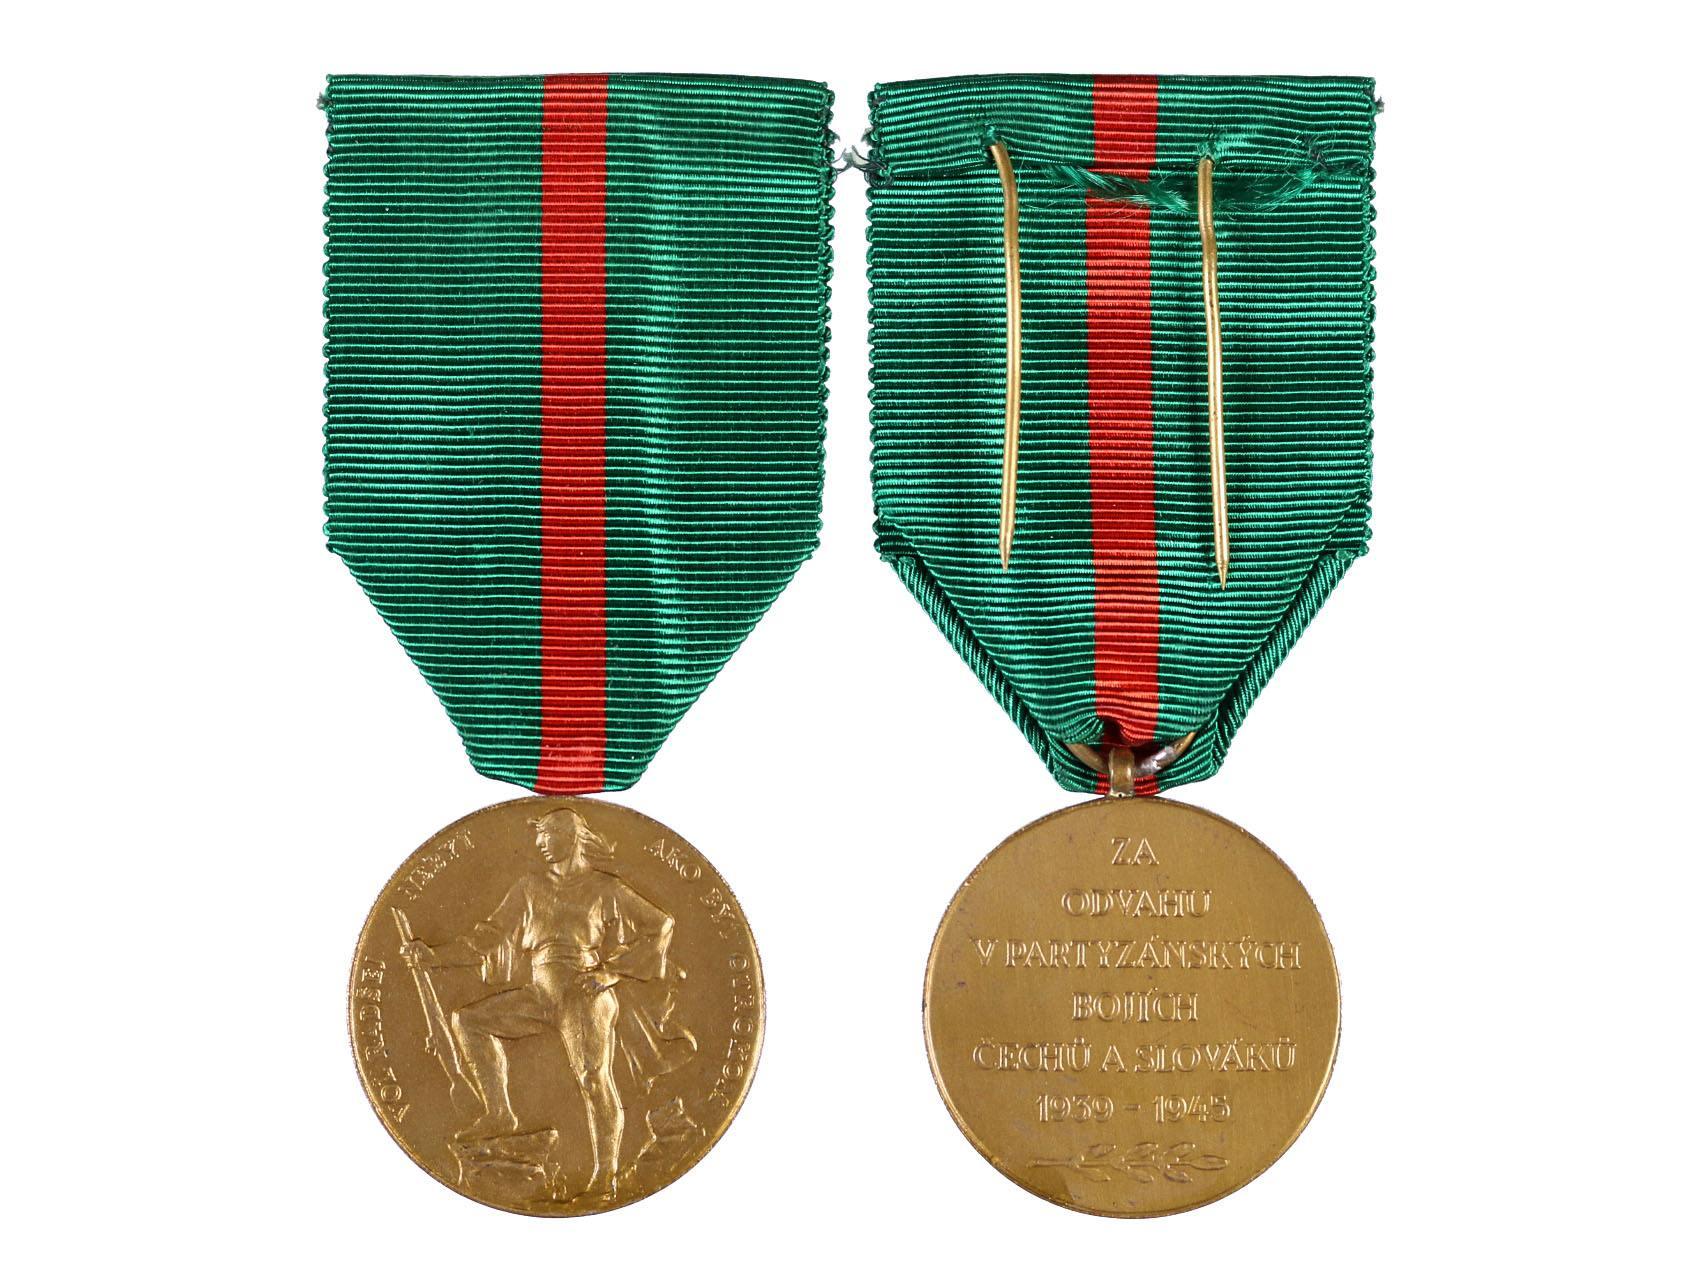 Československá Jánošíkova medaile, VM21, N36